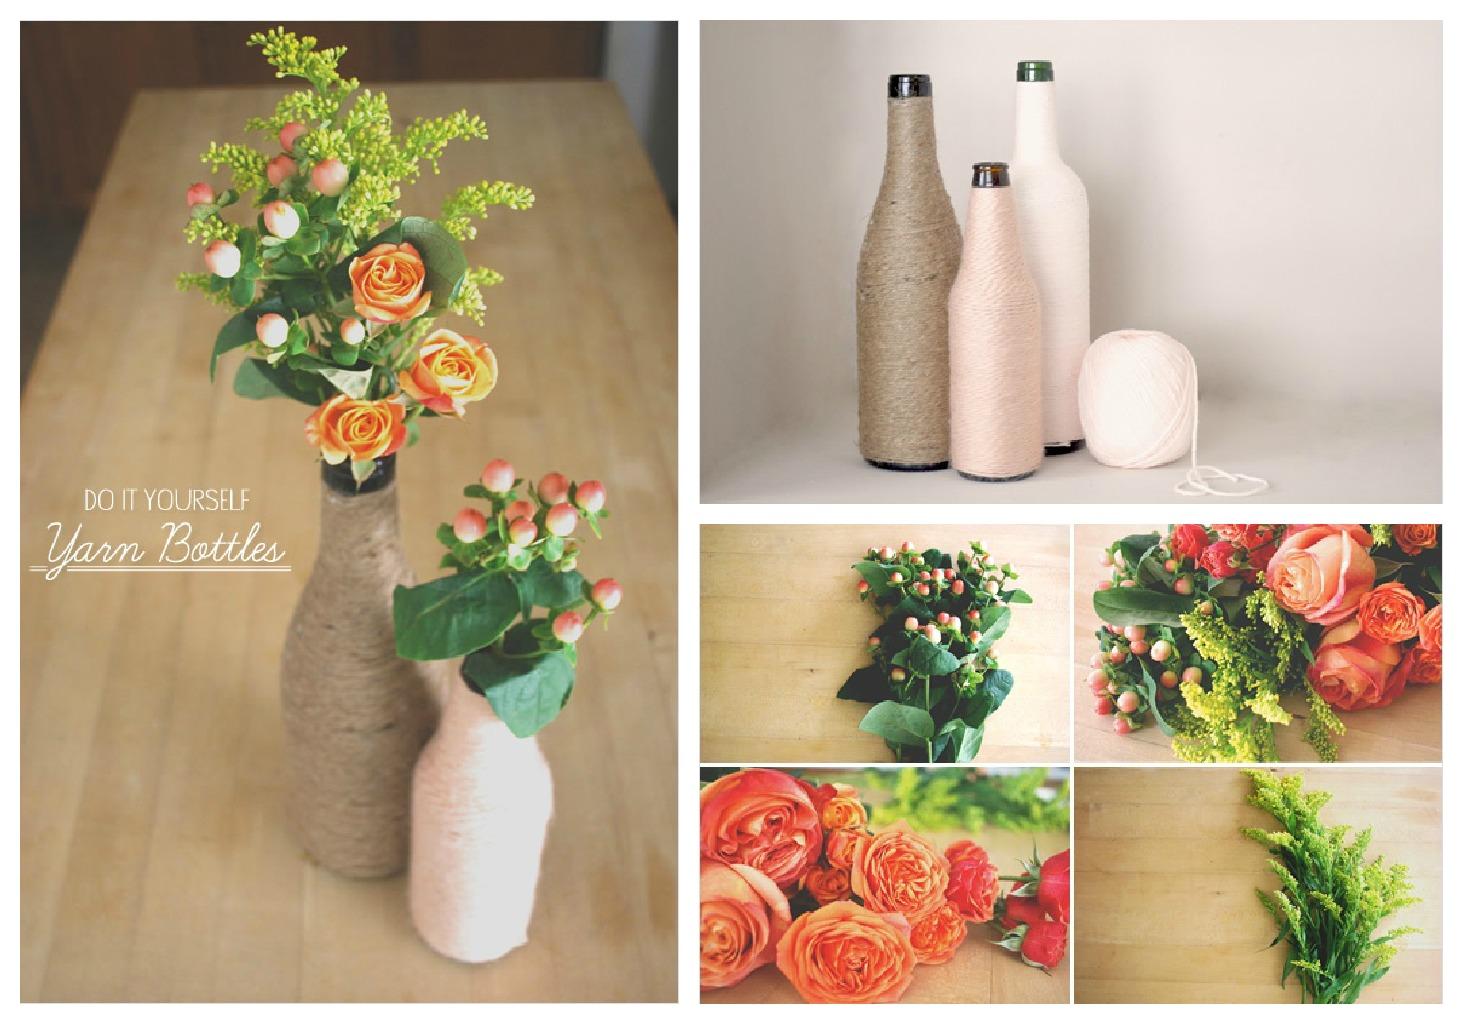 DIY Yarn Wrapped Bottles // Home Decor